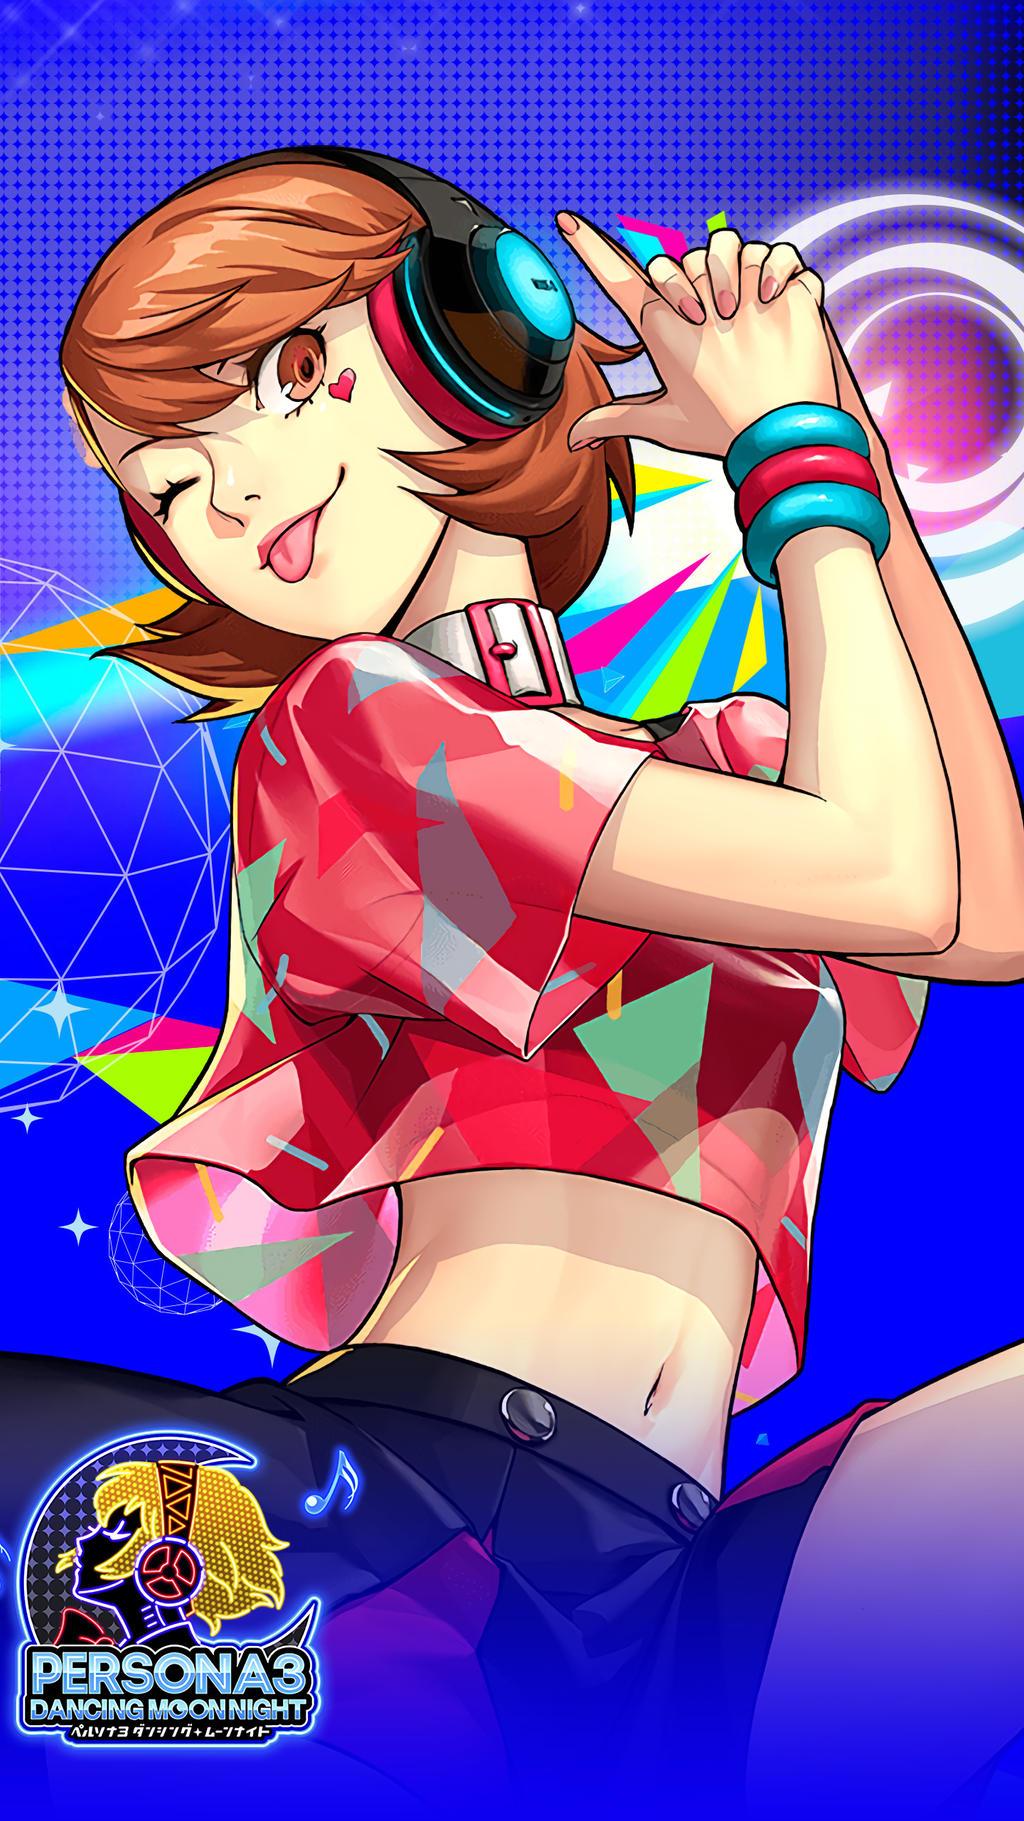 Persona 3 Dancing Moon Night Yukari Wallpaper By Farizf On Deviantart